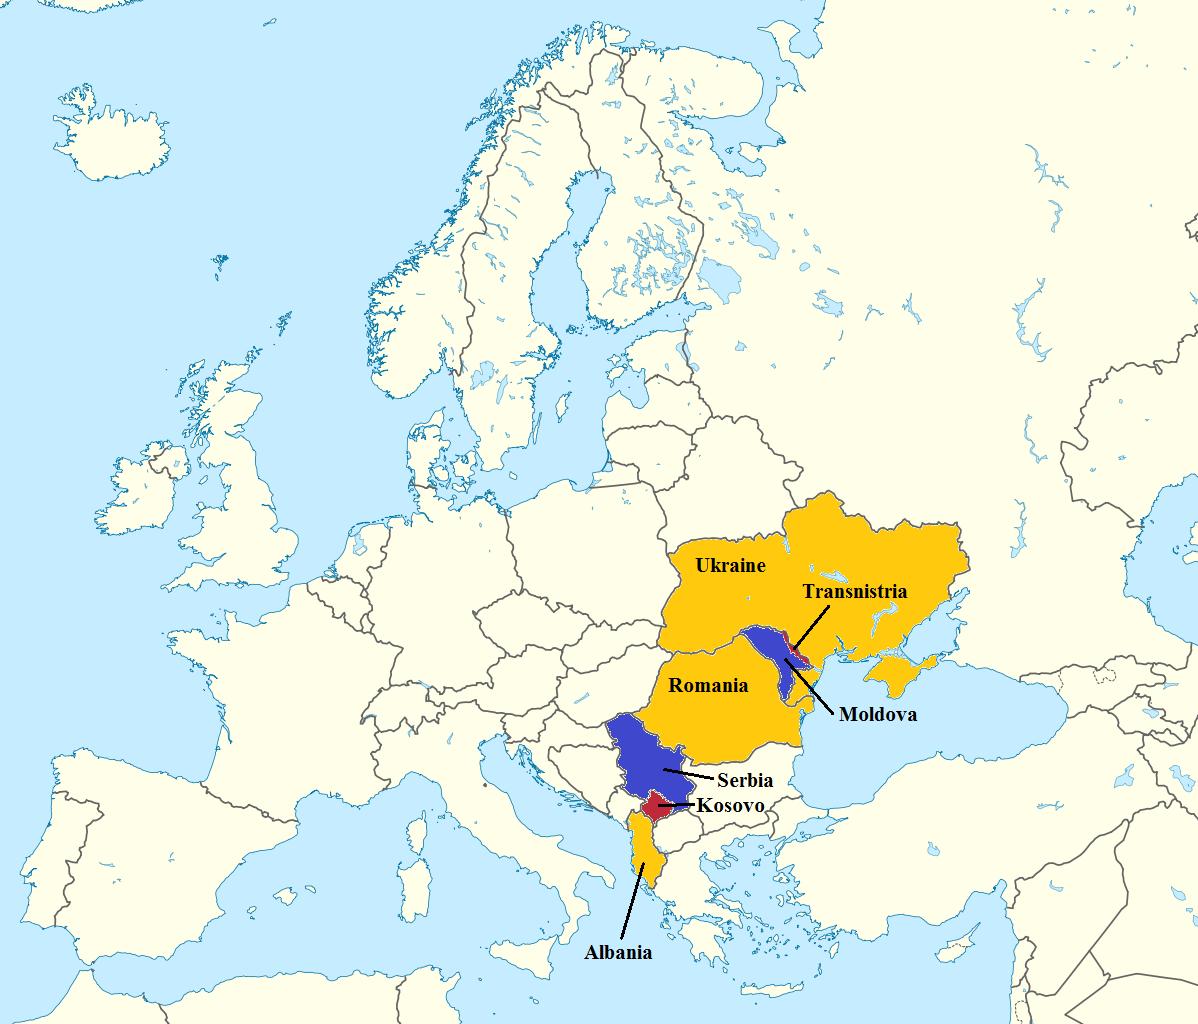 Shifty lines kosovo and transnistria alex and ania splain you a thing kosovo gumiabroncs Choice Image